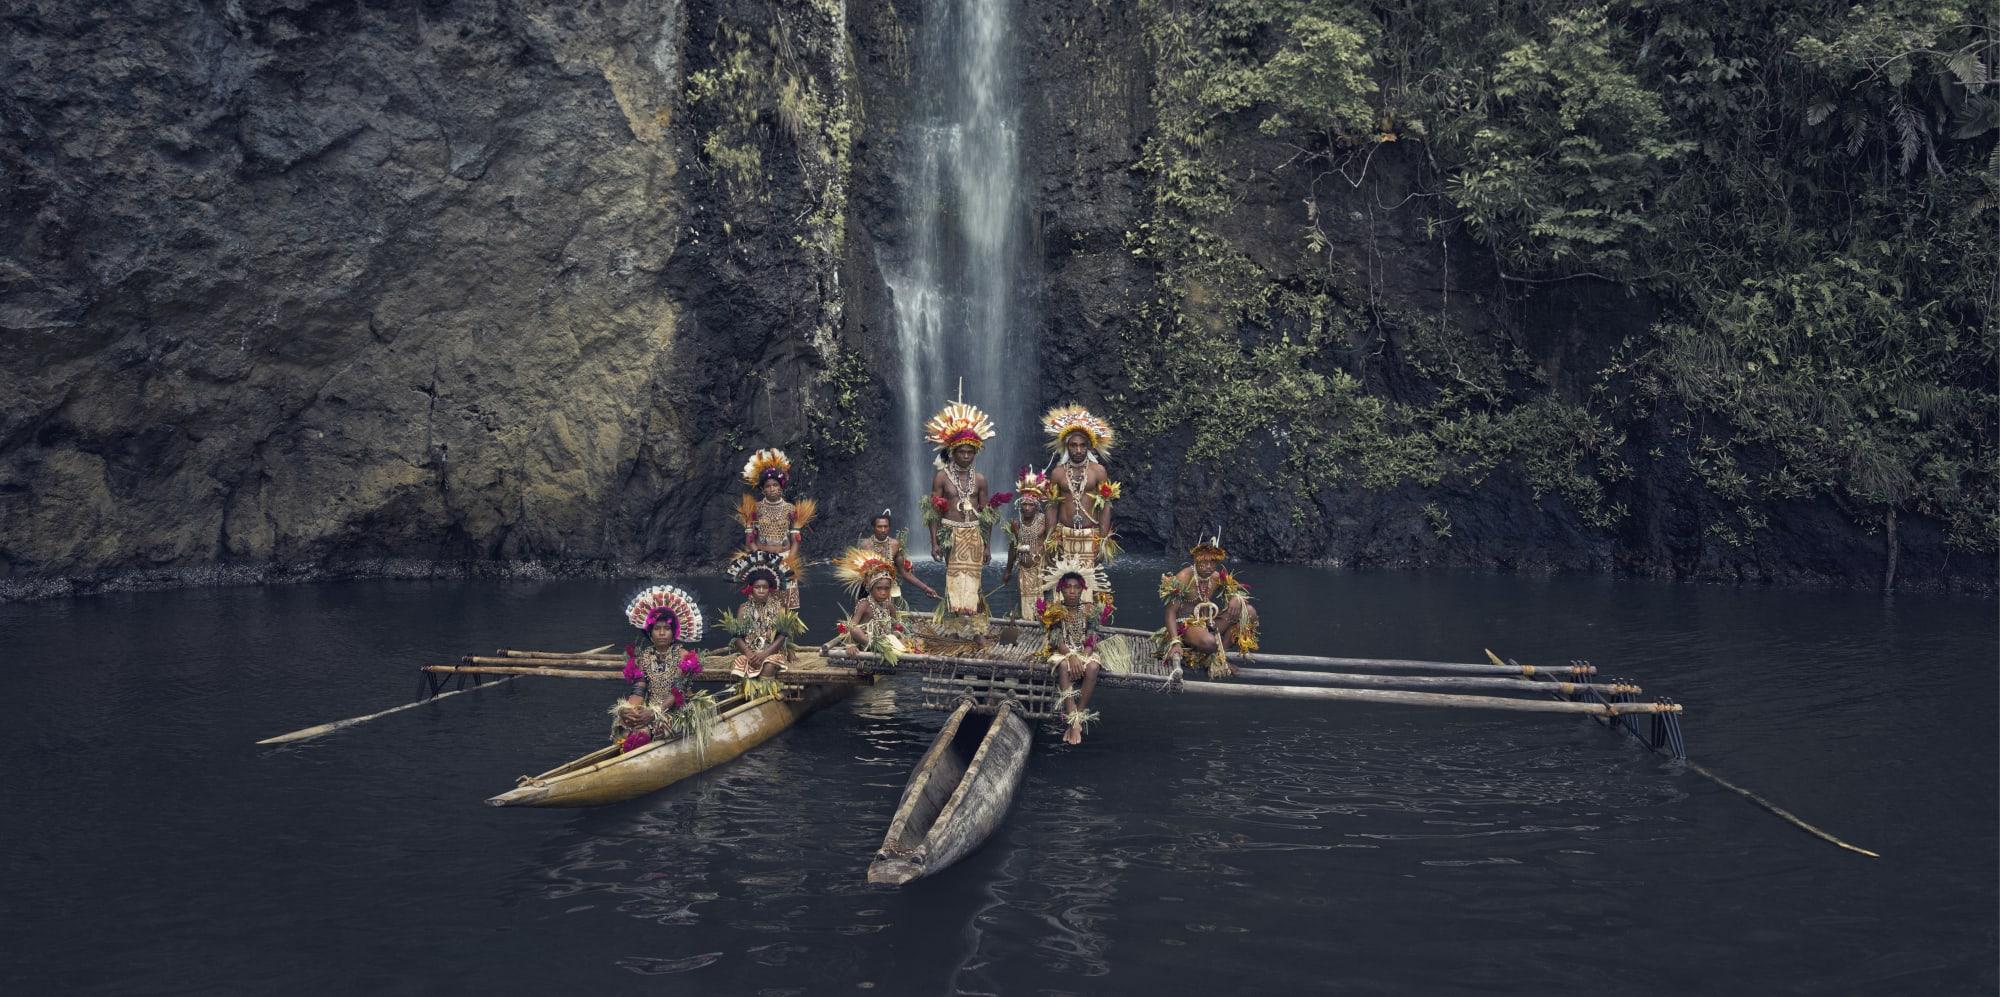 Blink Gallery 298892 XXXIII 1 Amuioan Tufi Papua New Guinea 2017 b546f1 original 1544627407